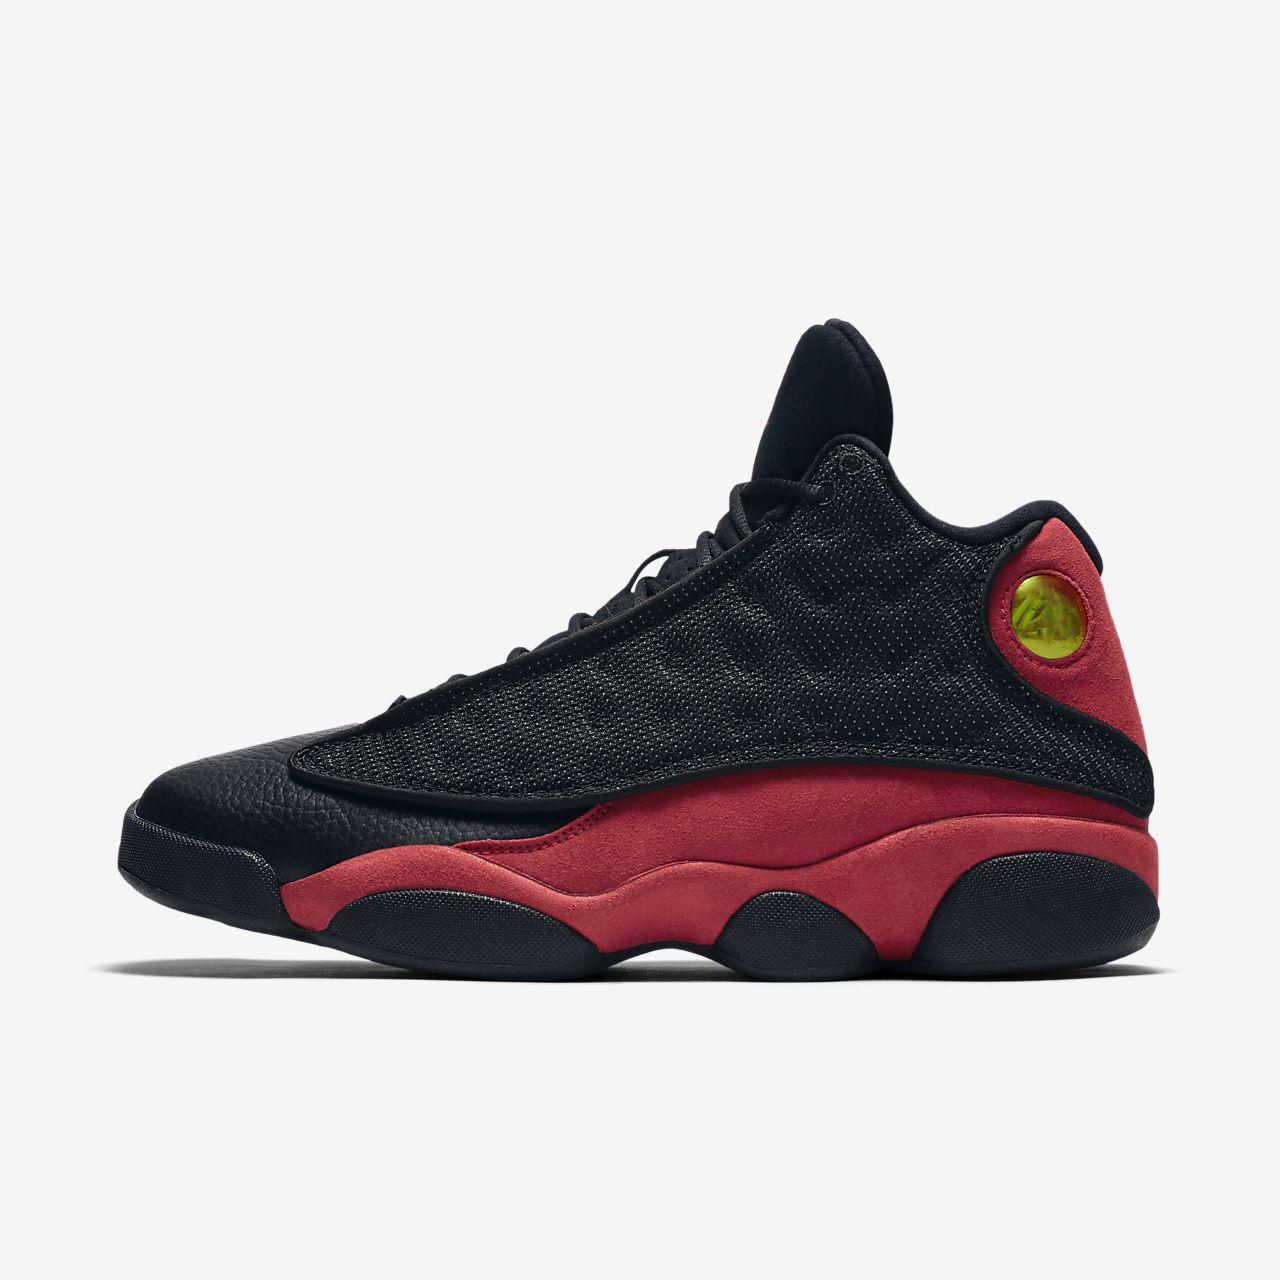 420fa9f84e4 ... discount code for air jordan 13 retro mens shoe ad724 2757f ...